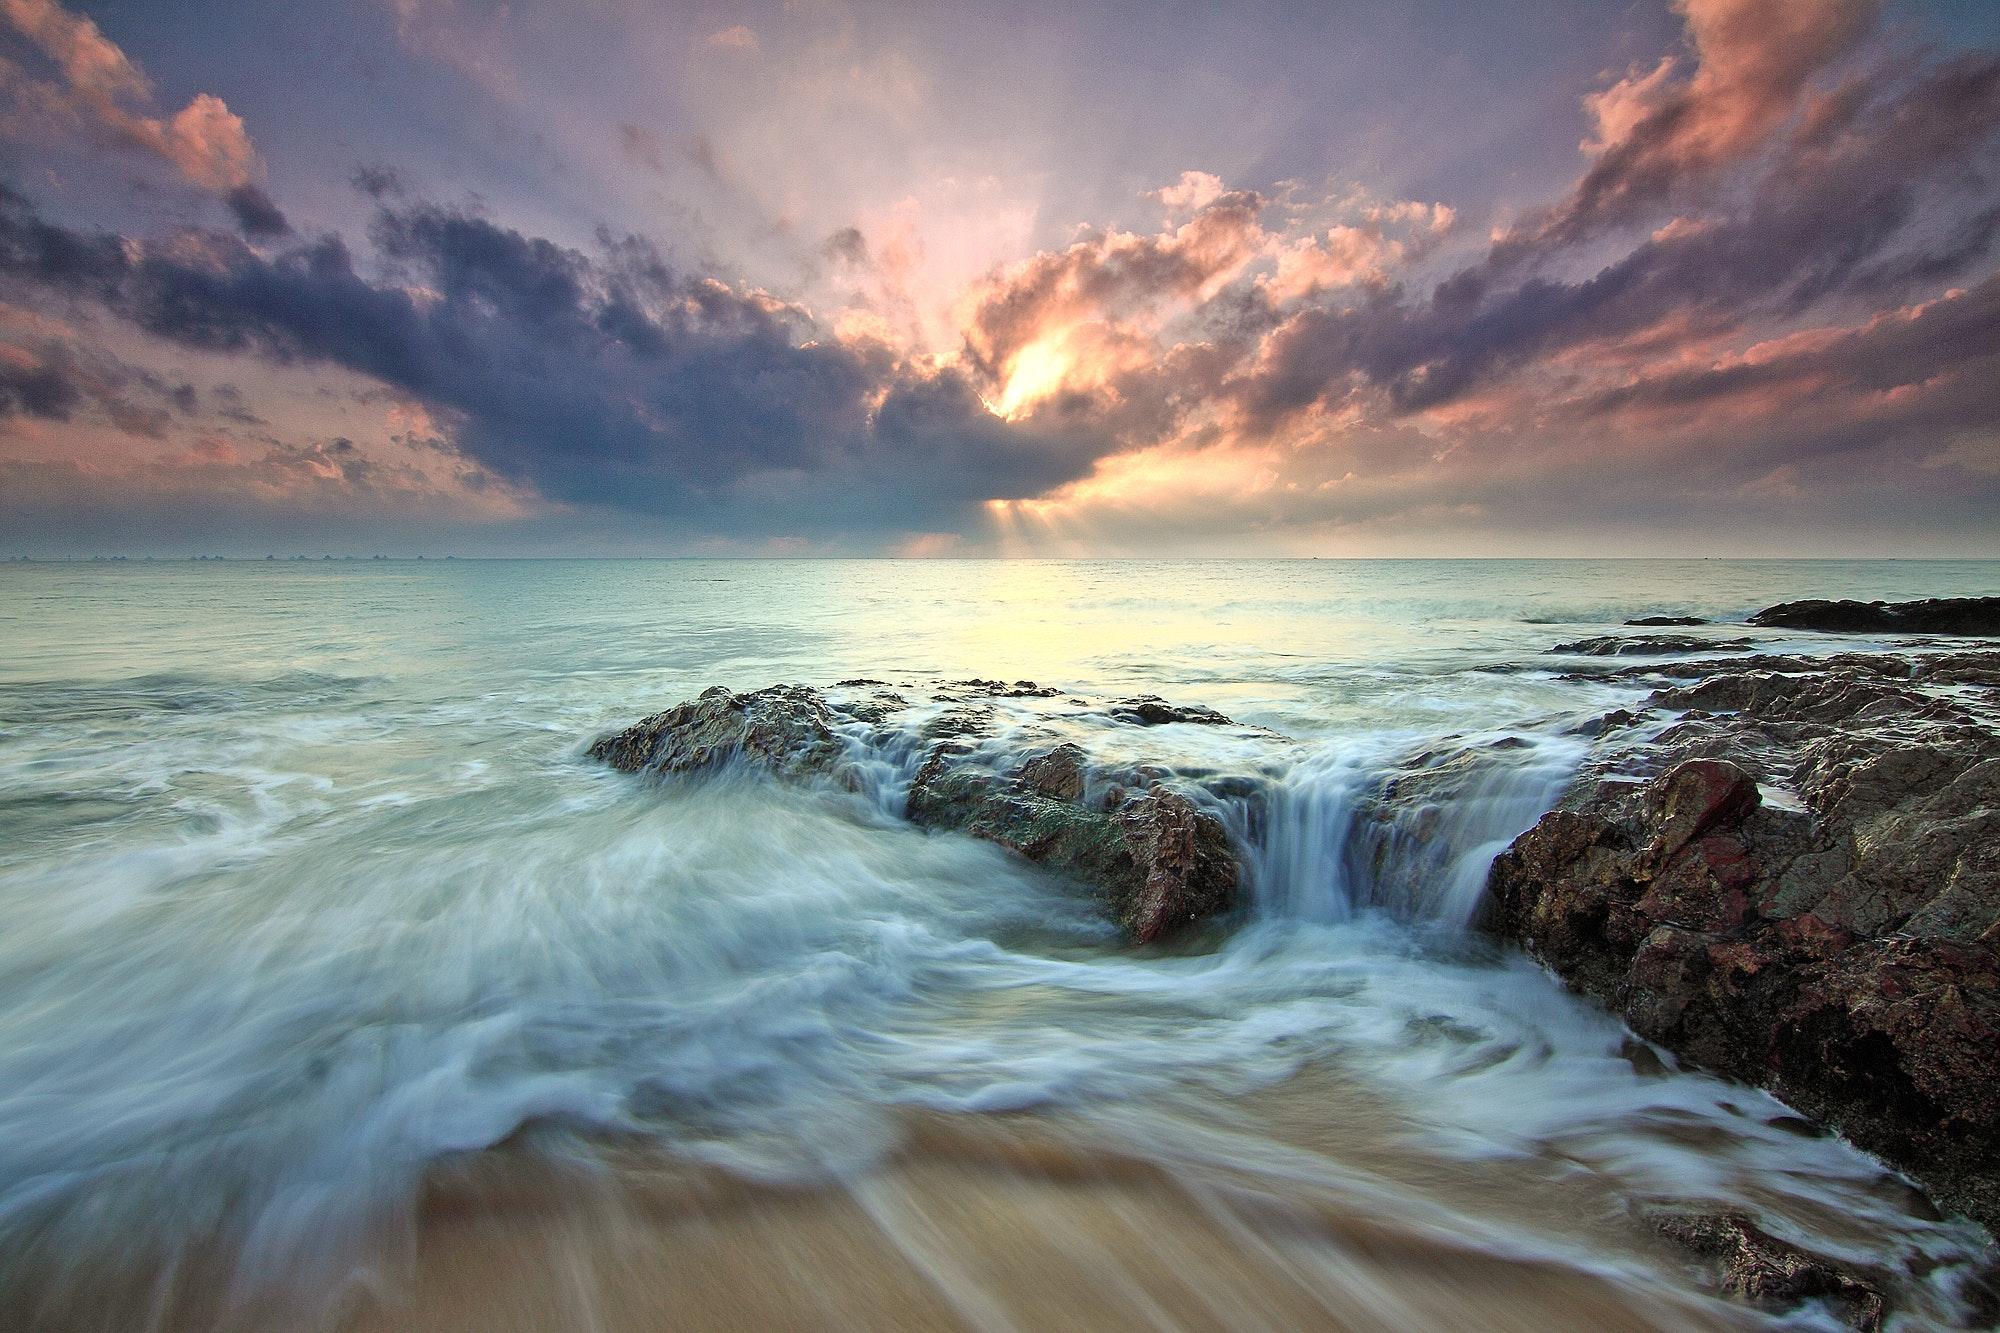 Beach Sea Dawn Dusk Landscape Ocean Rocks Sunlight Hd